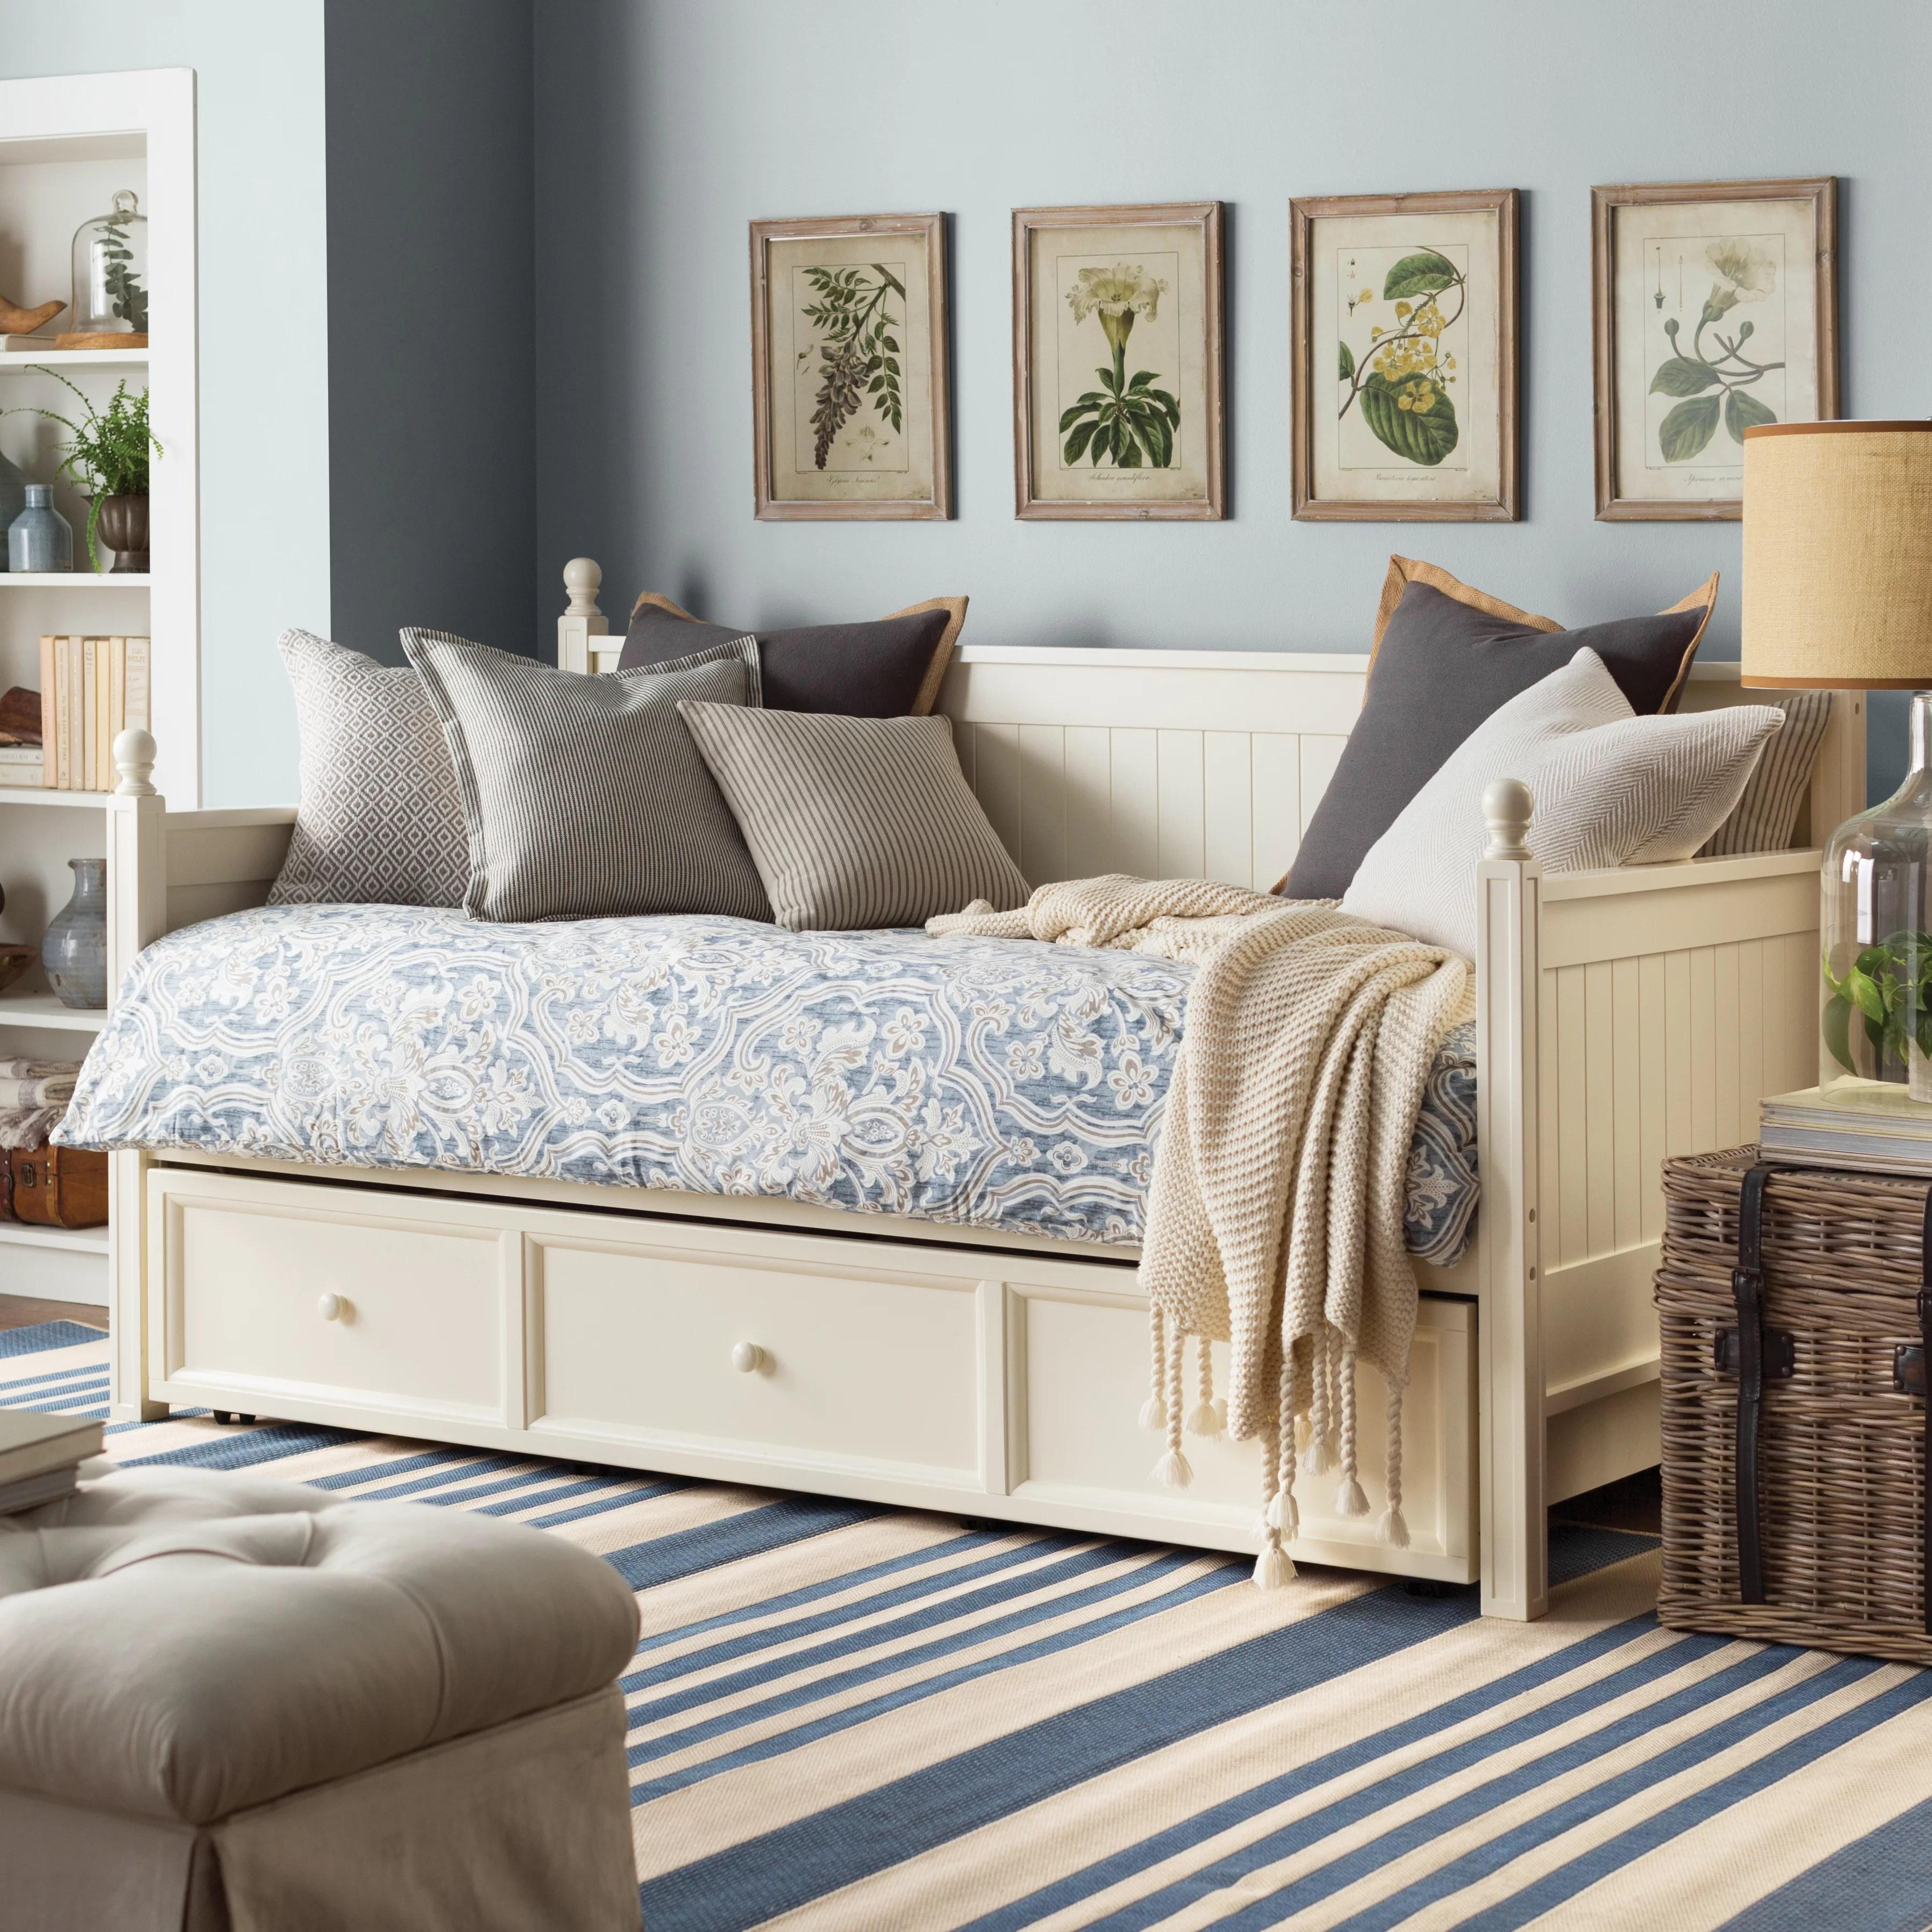 farmhouse rustic bedroom furniture